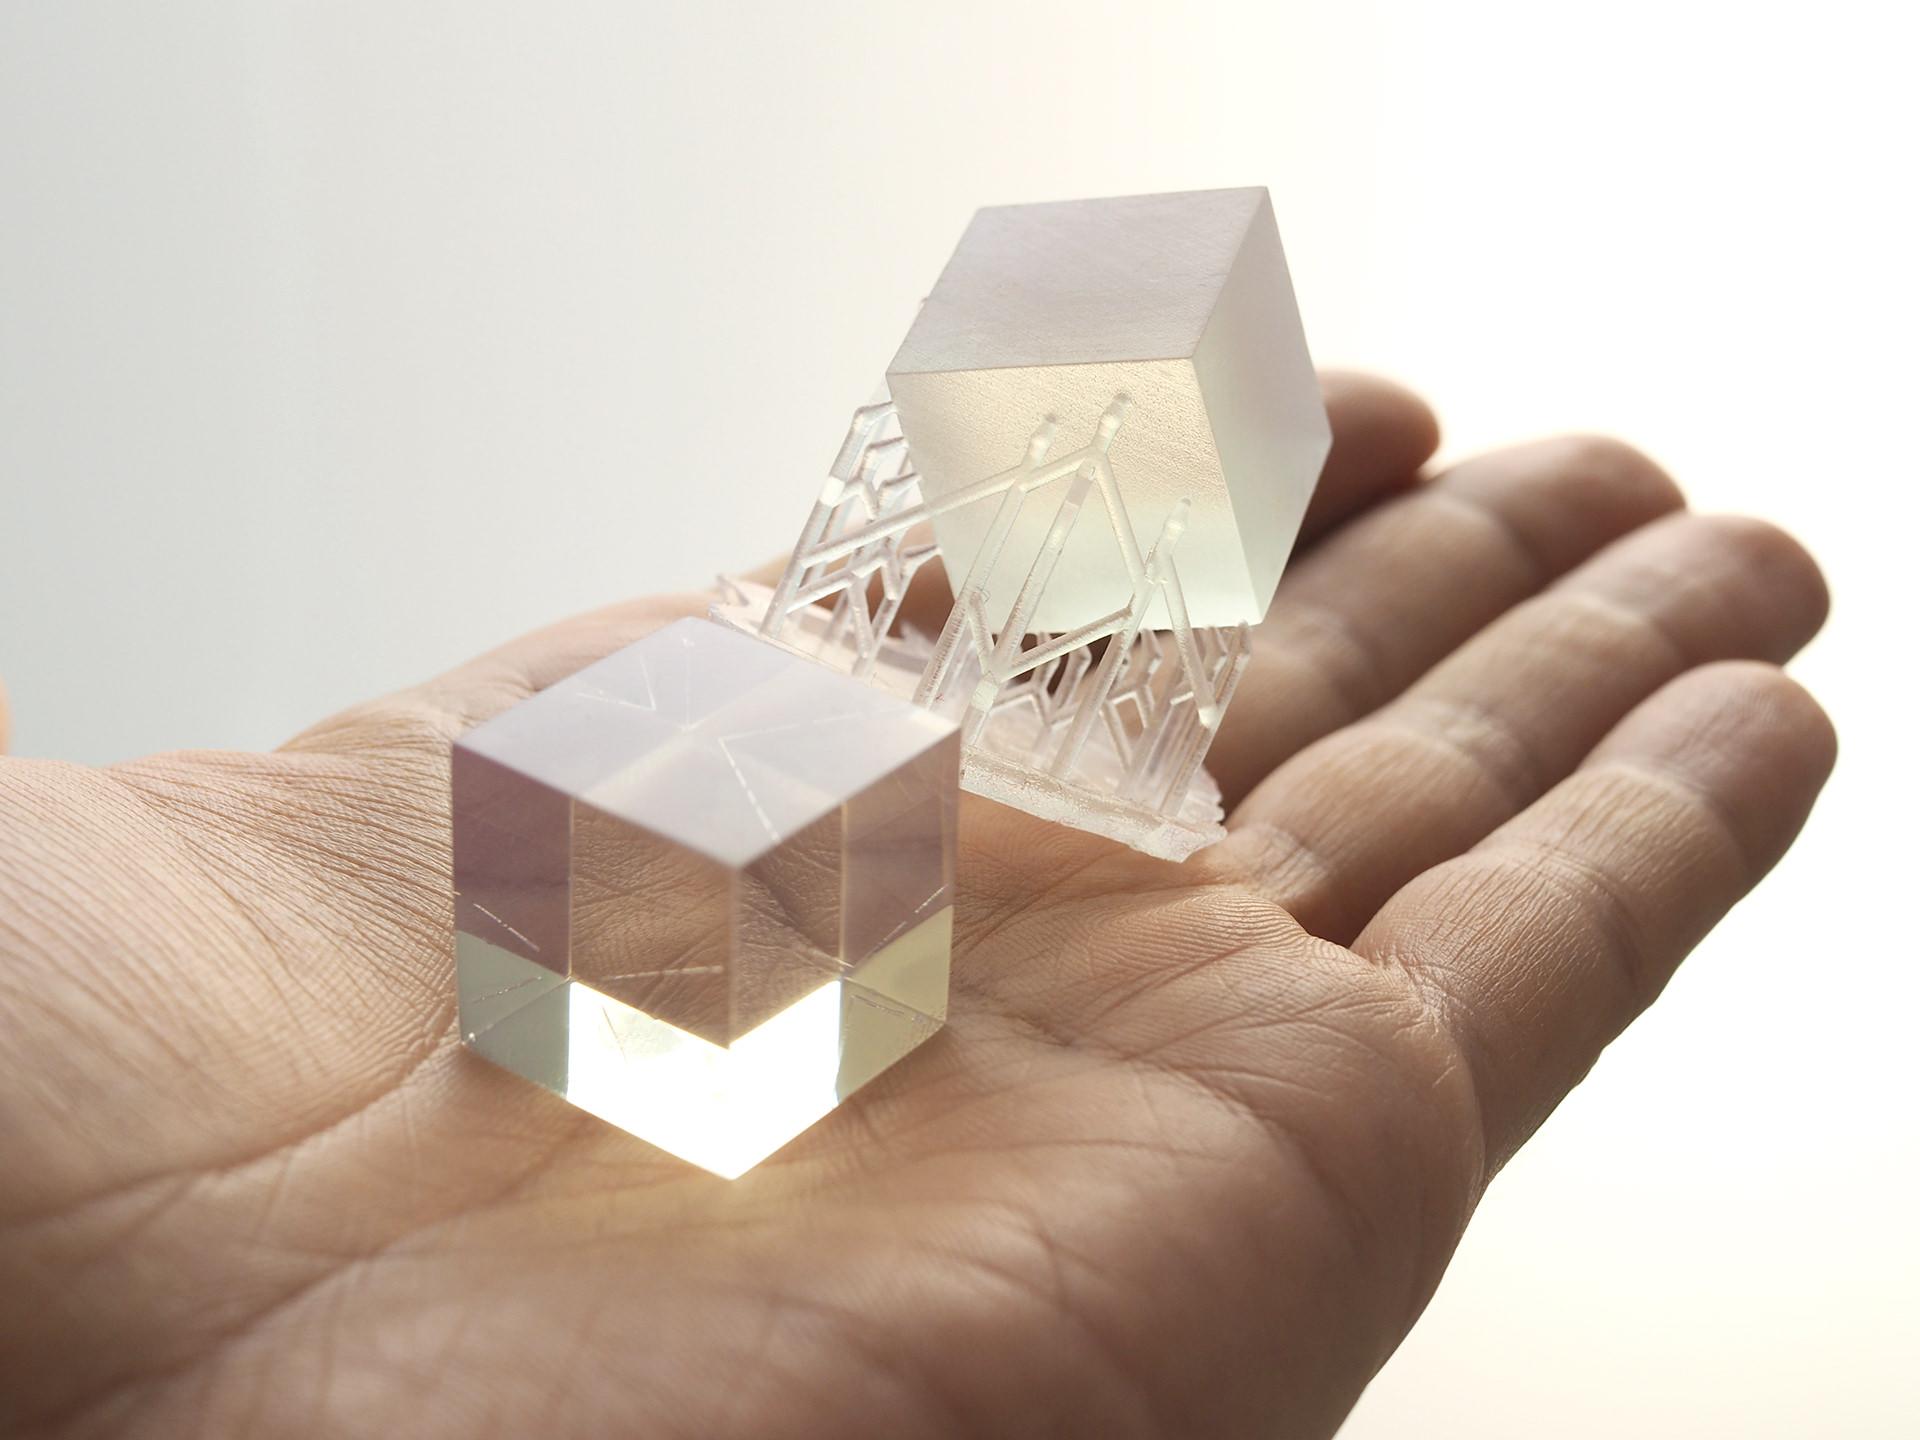 3Dプリントされた透明アクリル素材の研磨事例